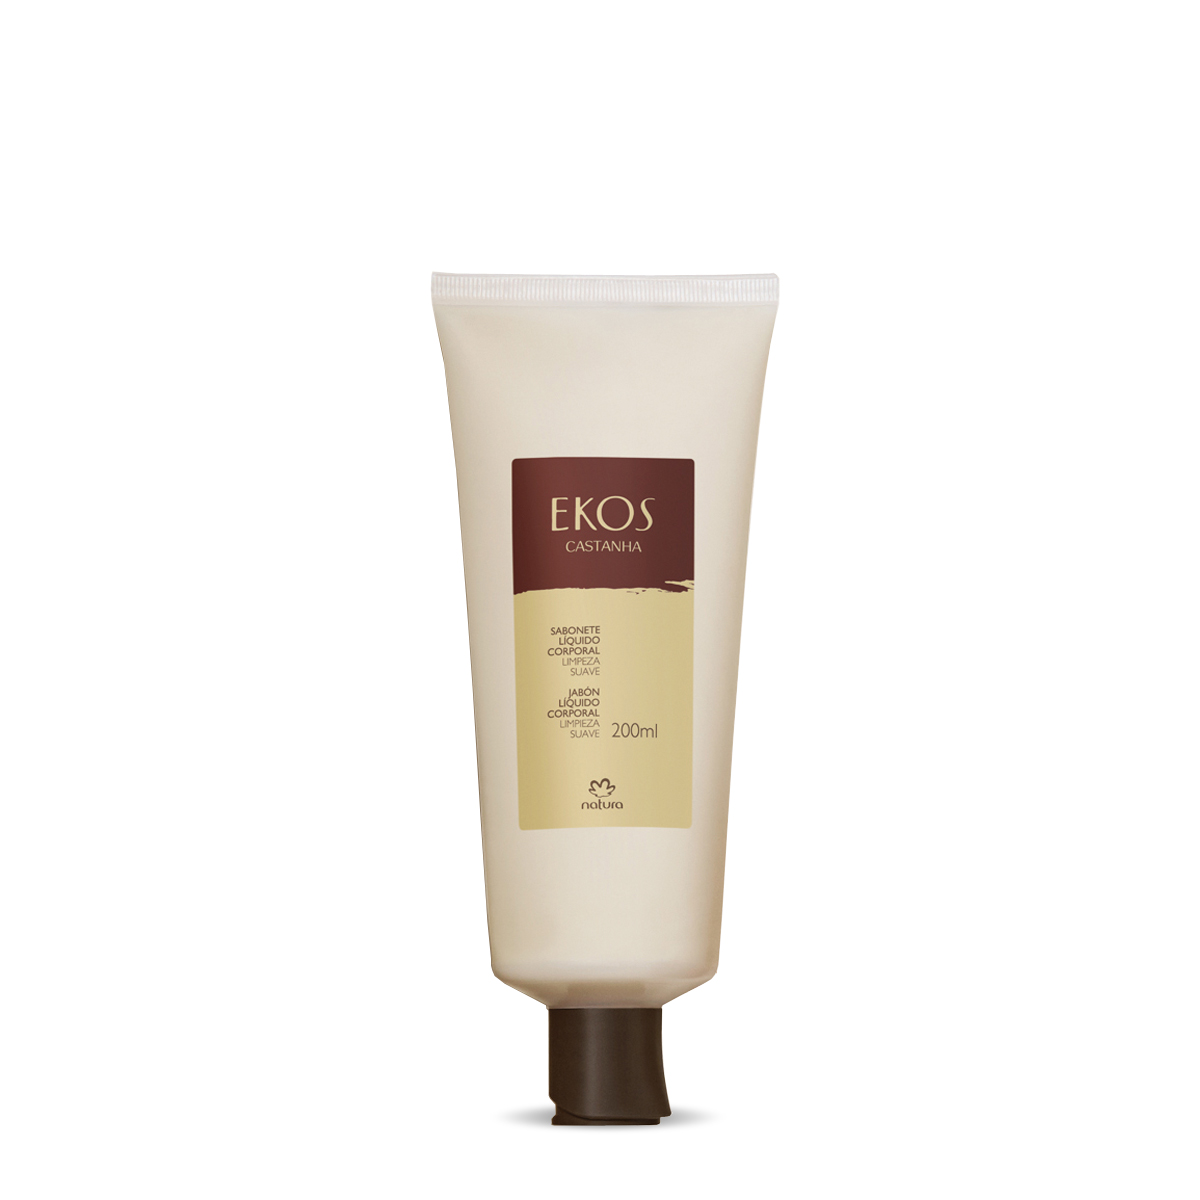 Ekos - Jabón líquido corporal - Castaña